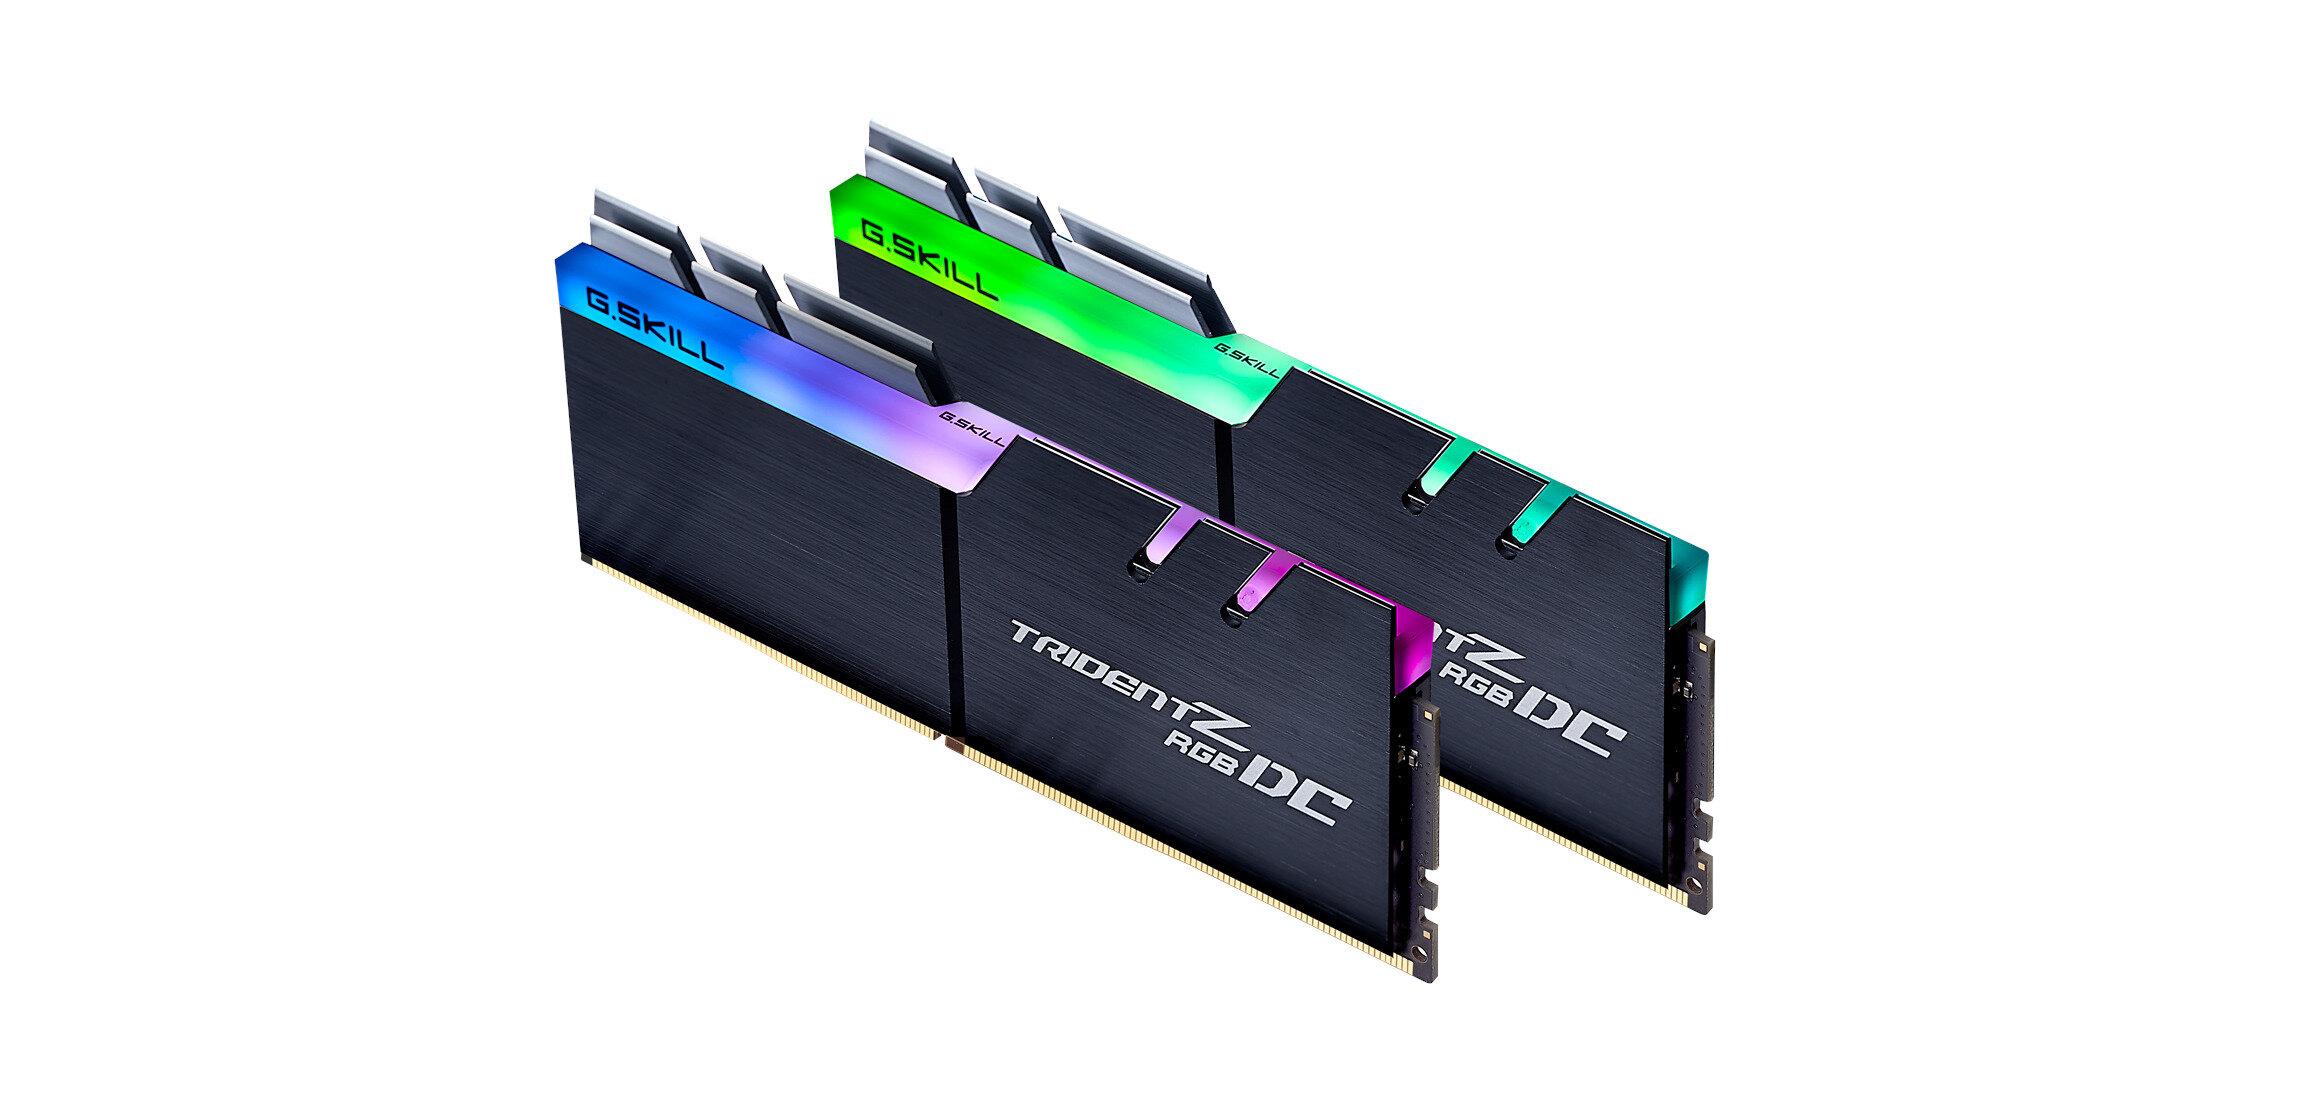 Barrettes DDR4 de 32 Go : les constructeurs s'adaptent, jusqu'à 256 Go sur Ryzen Threadripper